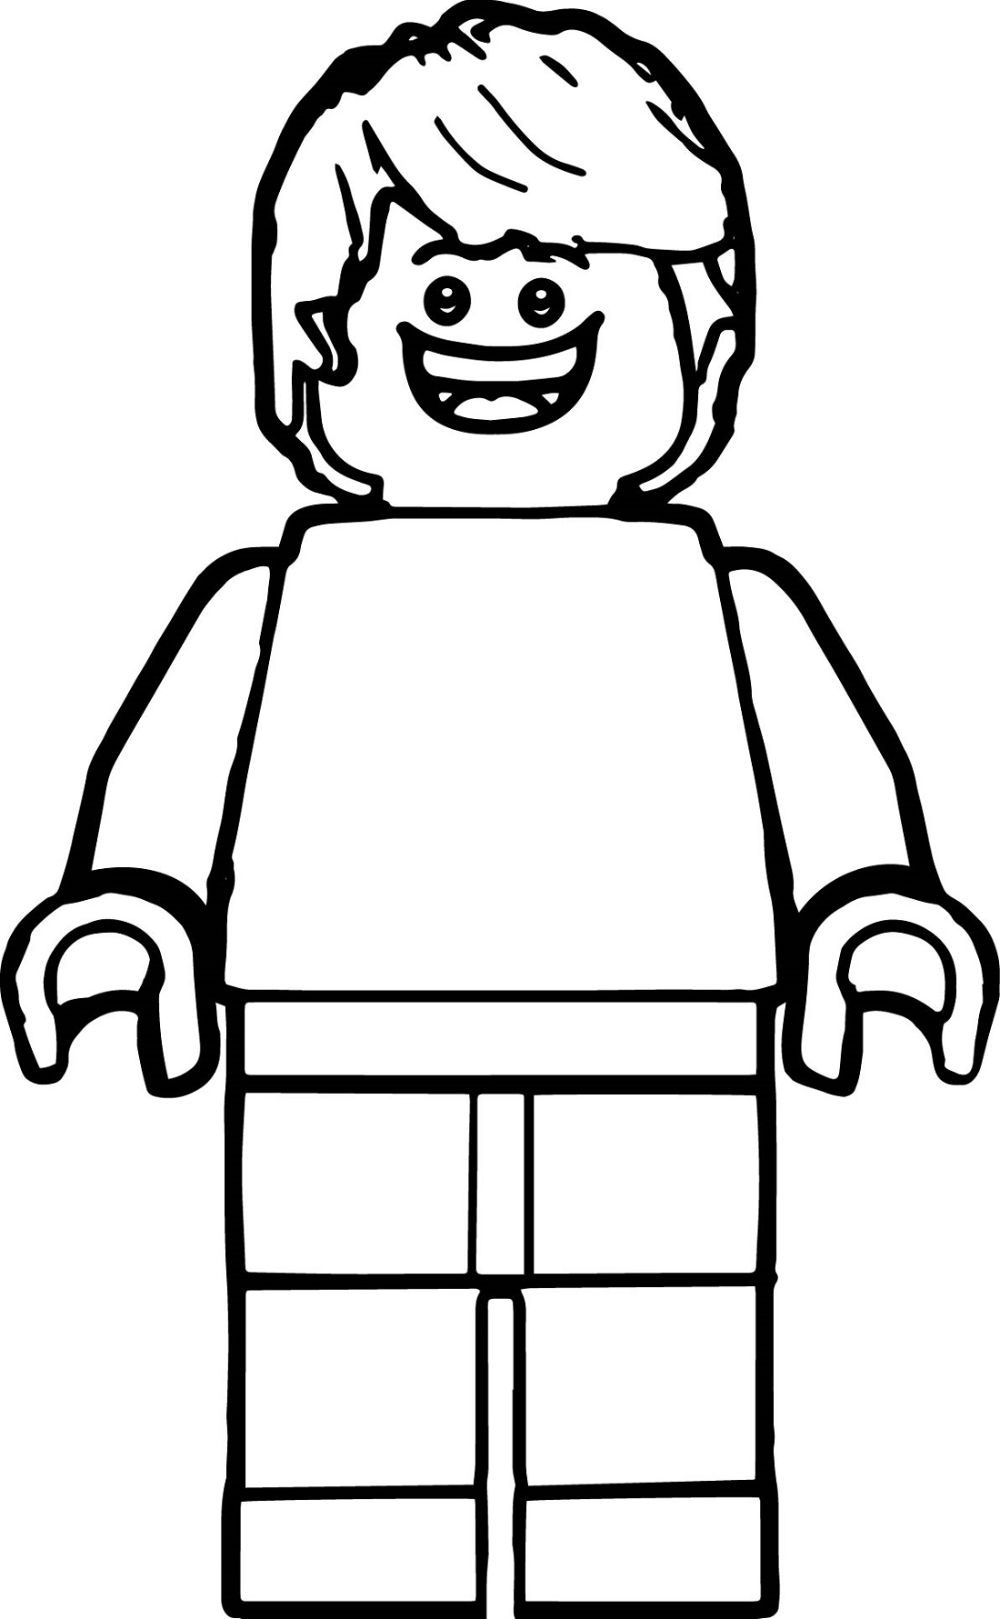 Lego Man Coloring Page Lego Coloring Lego Coloring Pages Superhero Coloring Pages